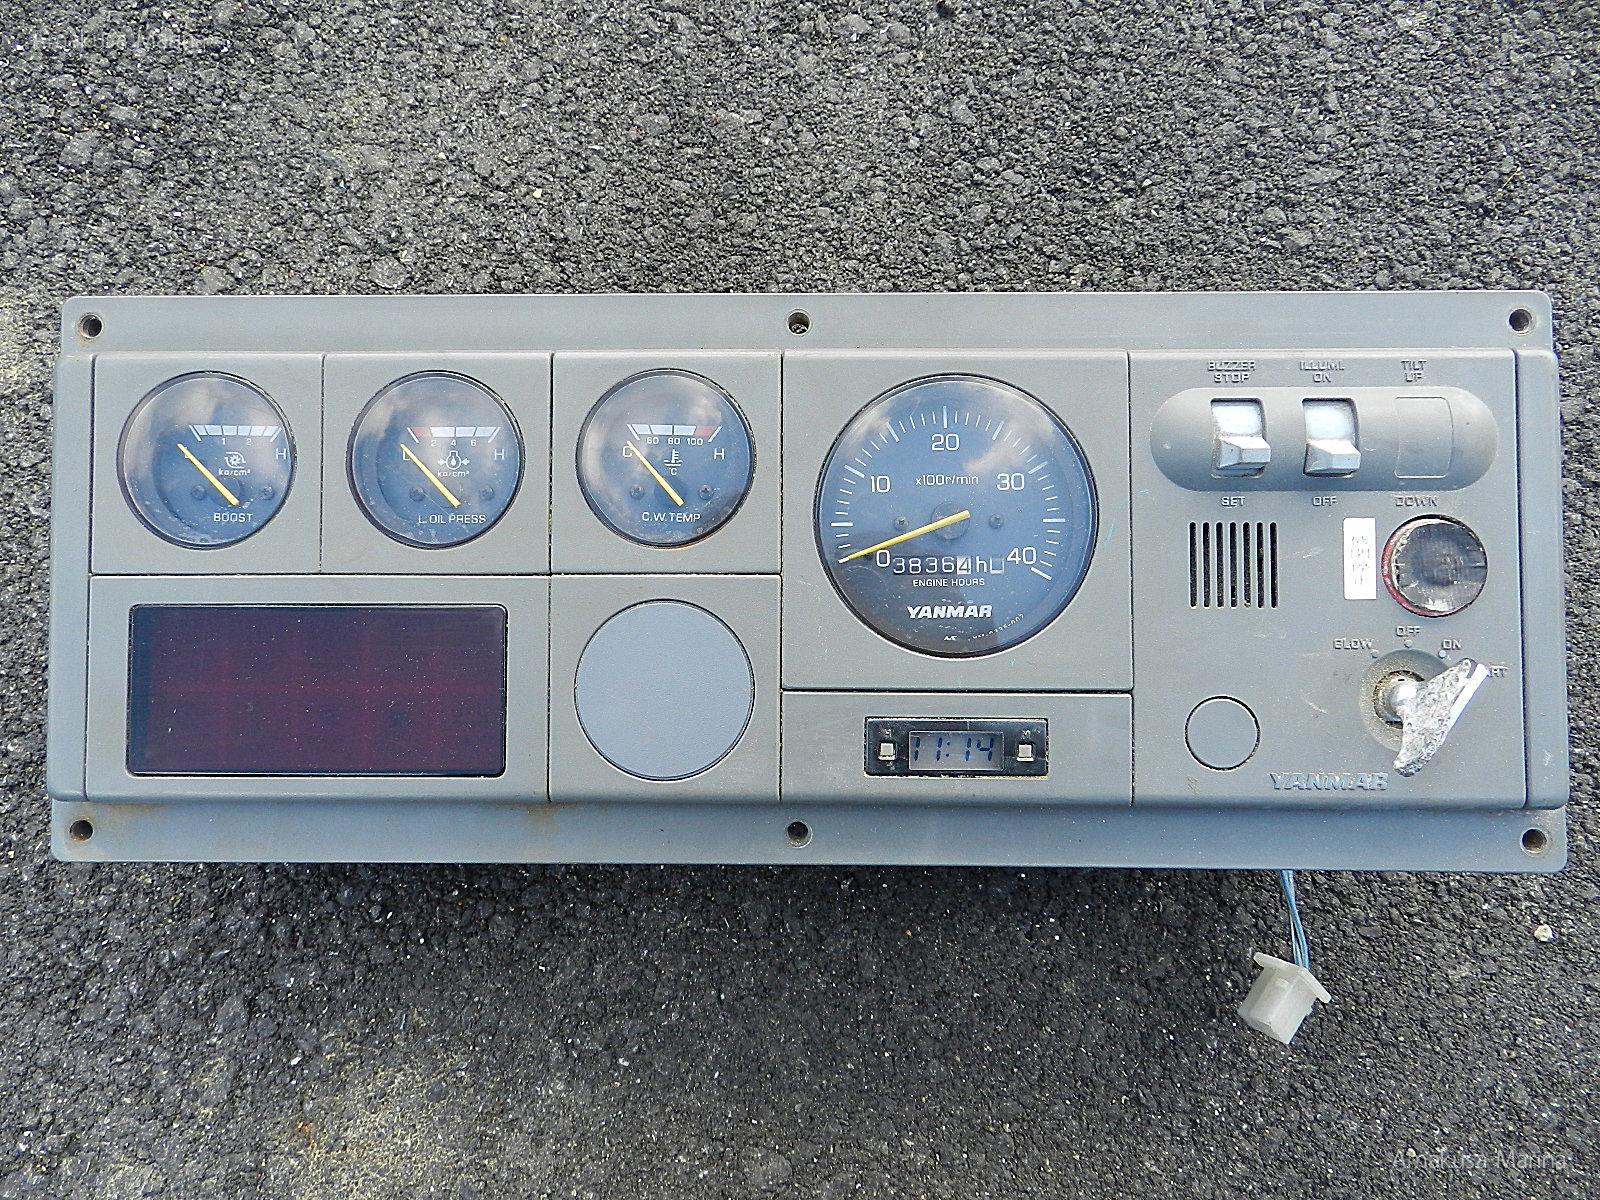 YANMAR 6LY2-ST 380PS 2 88 | Amakusa Marina & Co